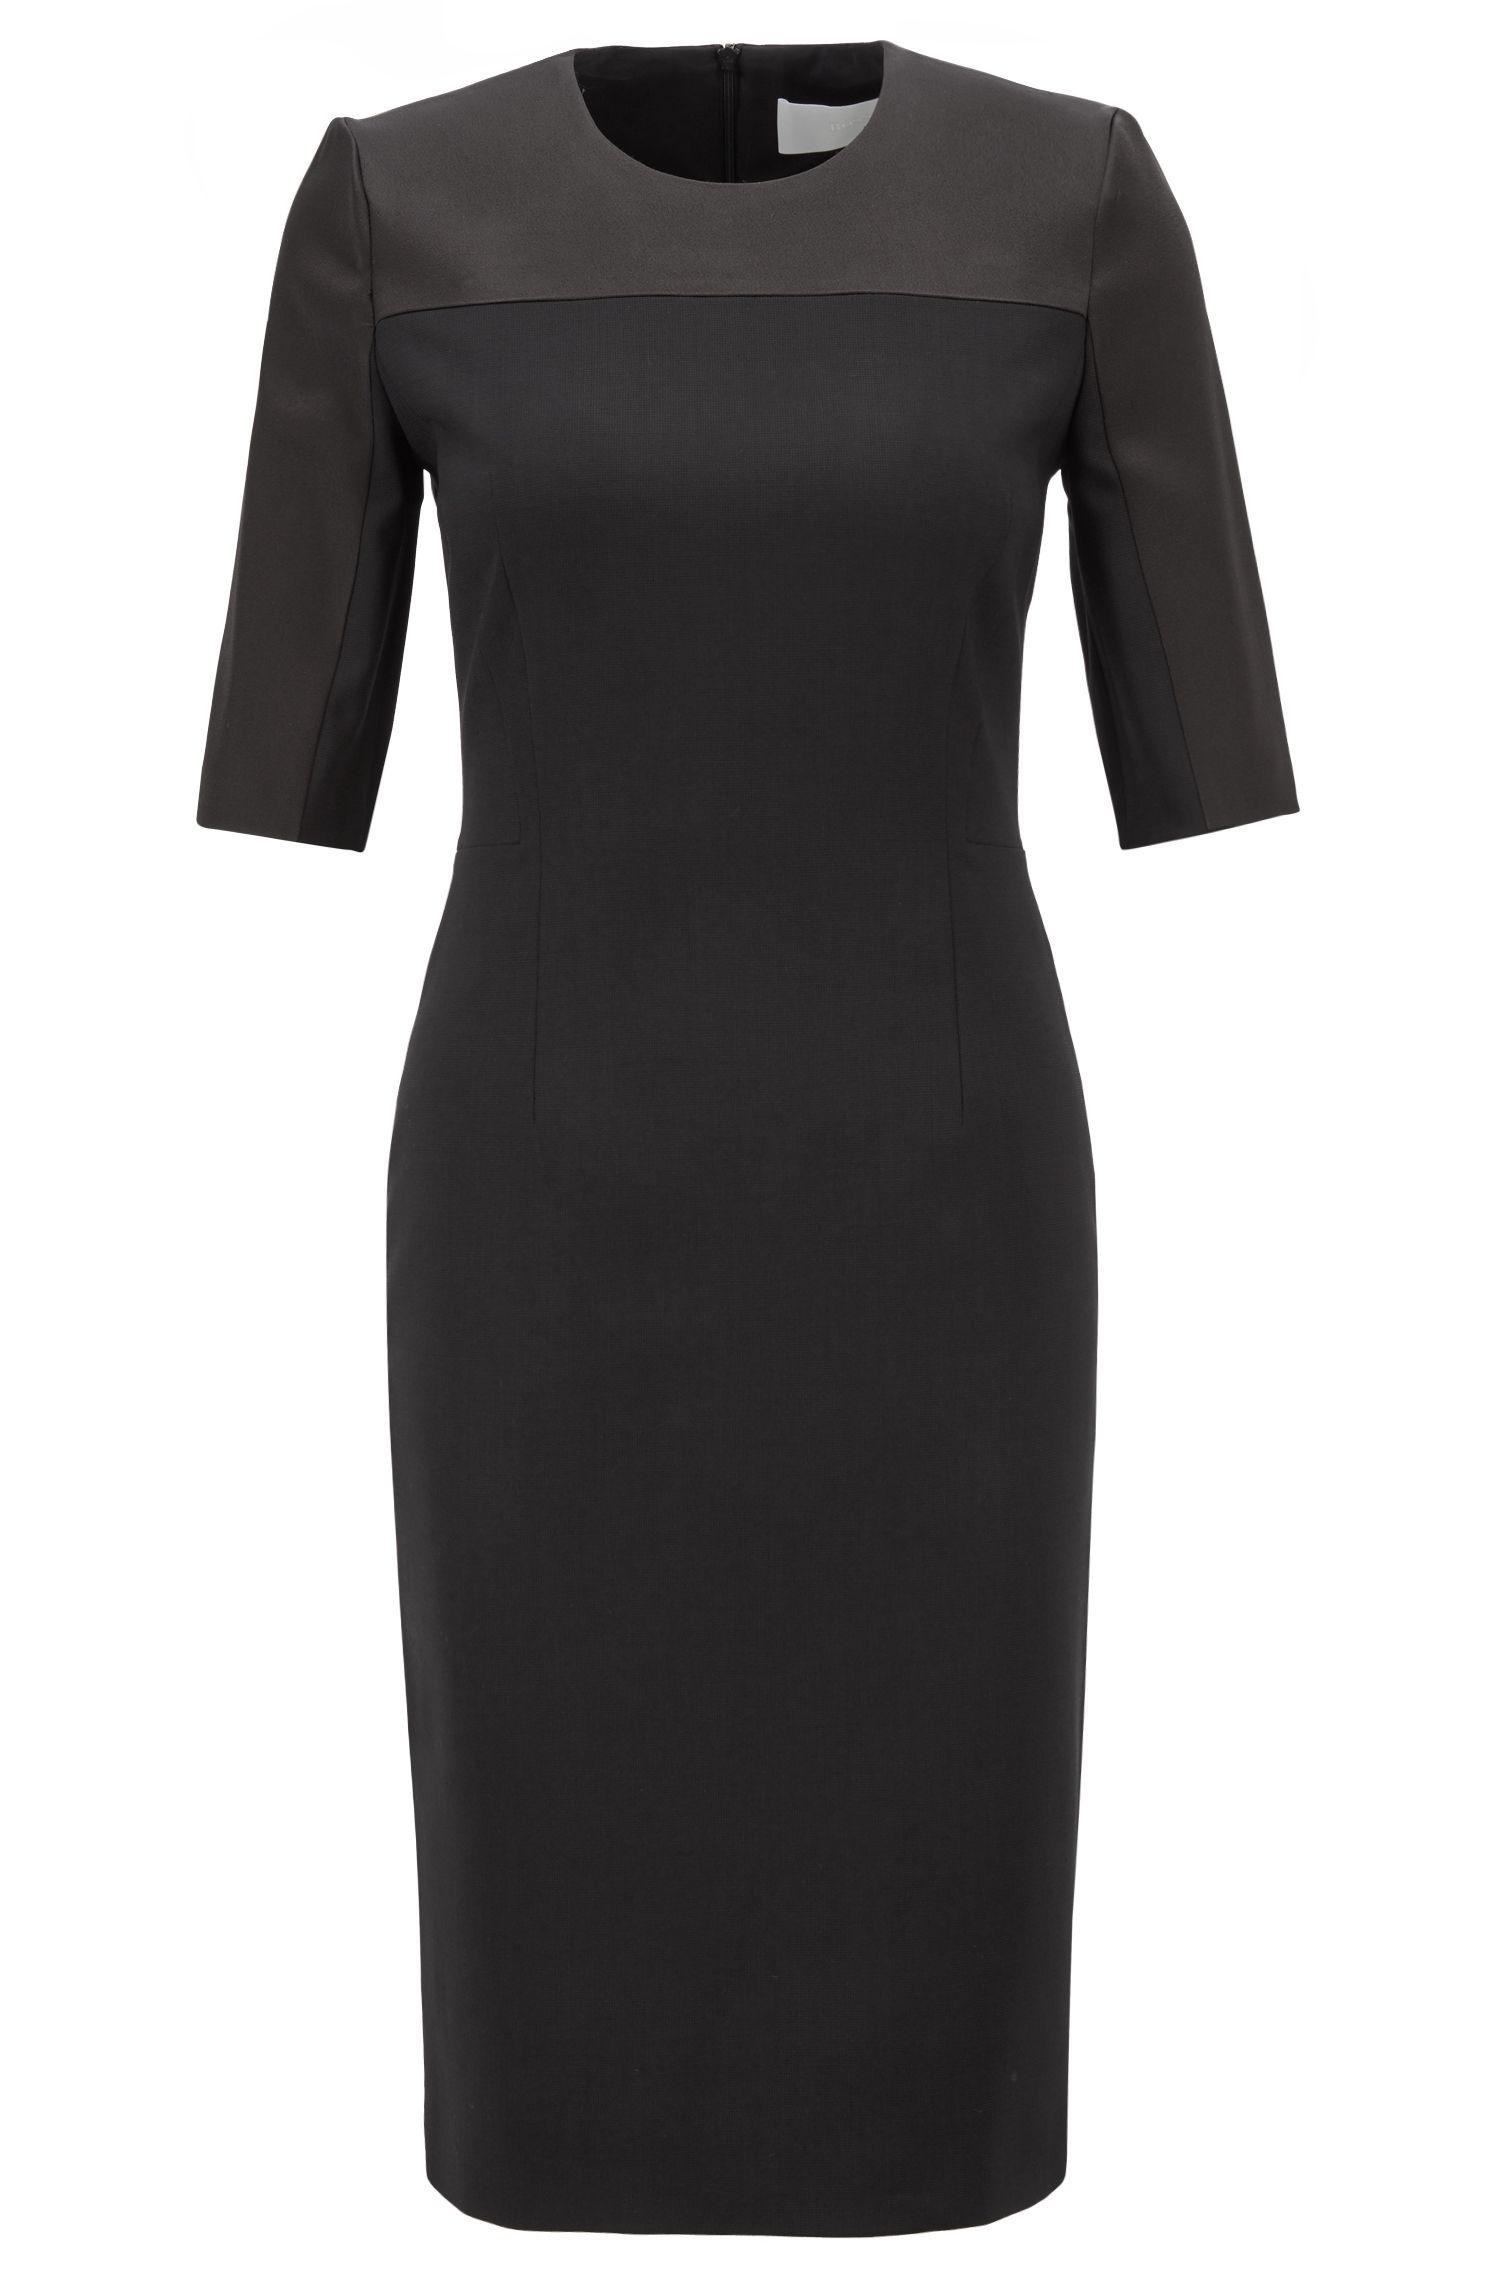 Cropped-sleeved dress in stretch virgin wool, Black